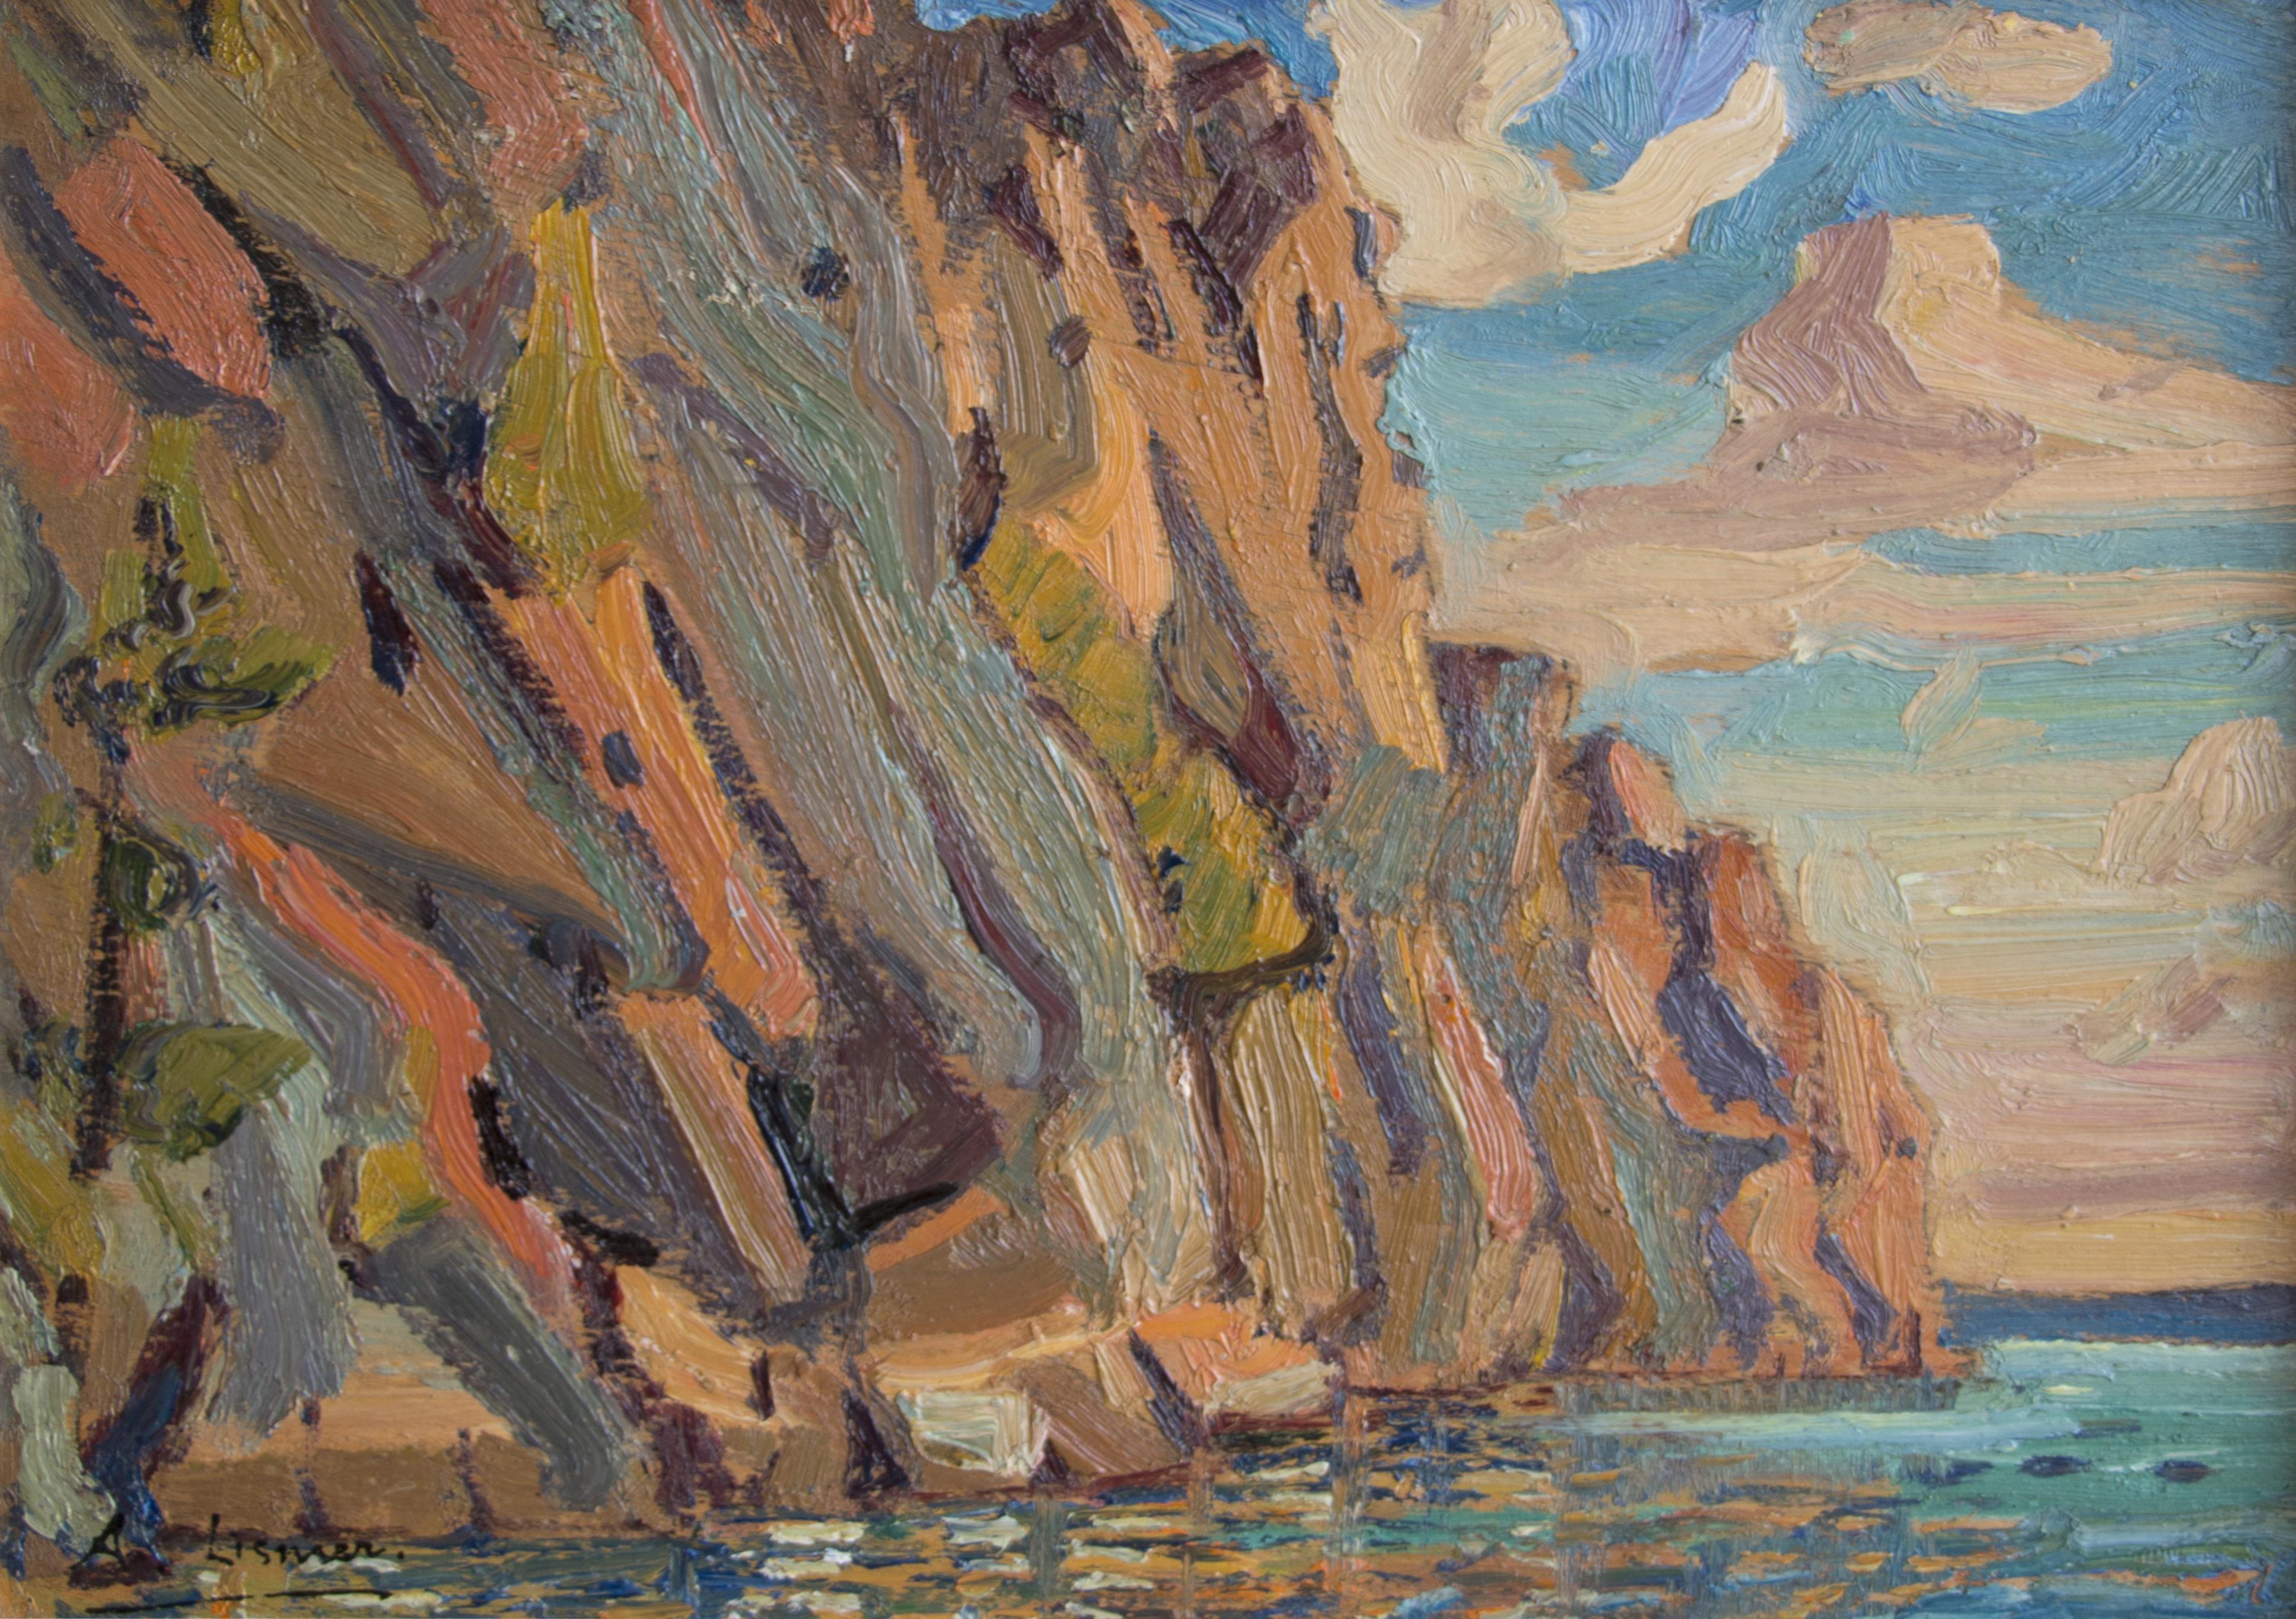 Arthur Lismer, Bon Echo, c. 1921-22